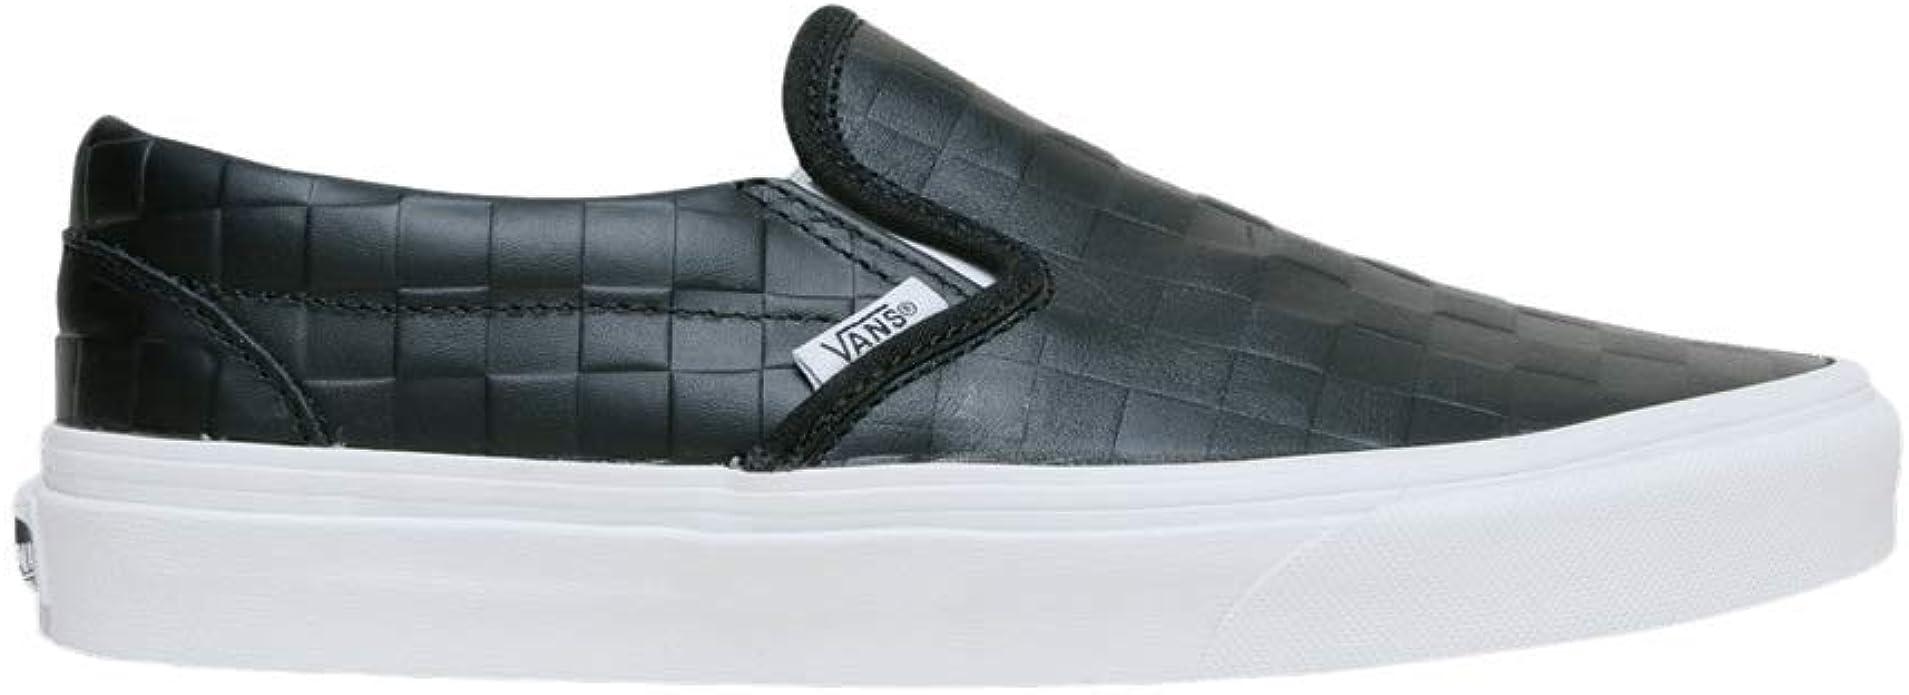 all black leather slip on vans